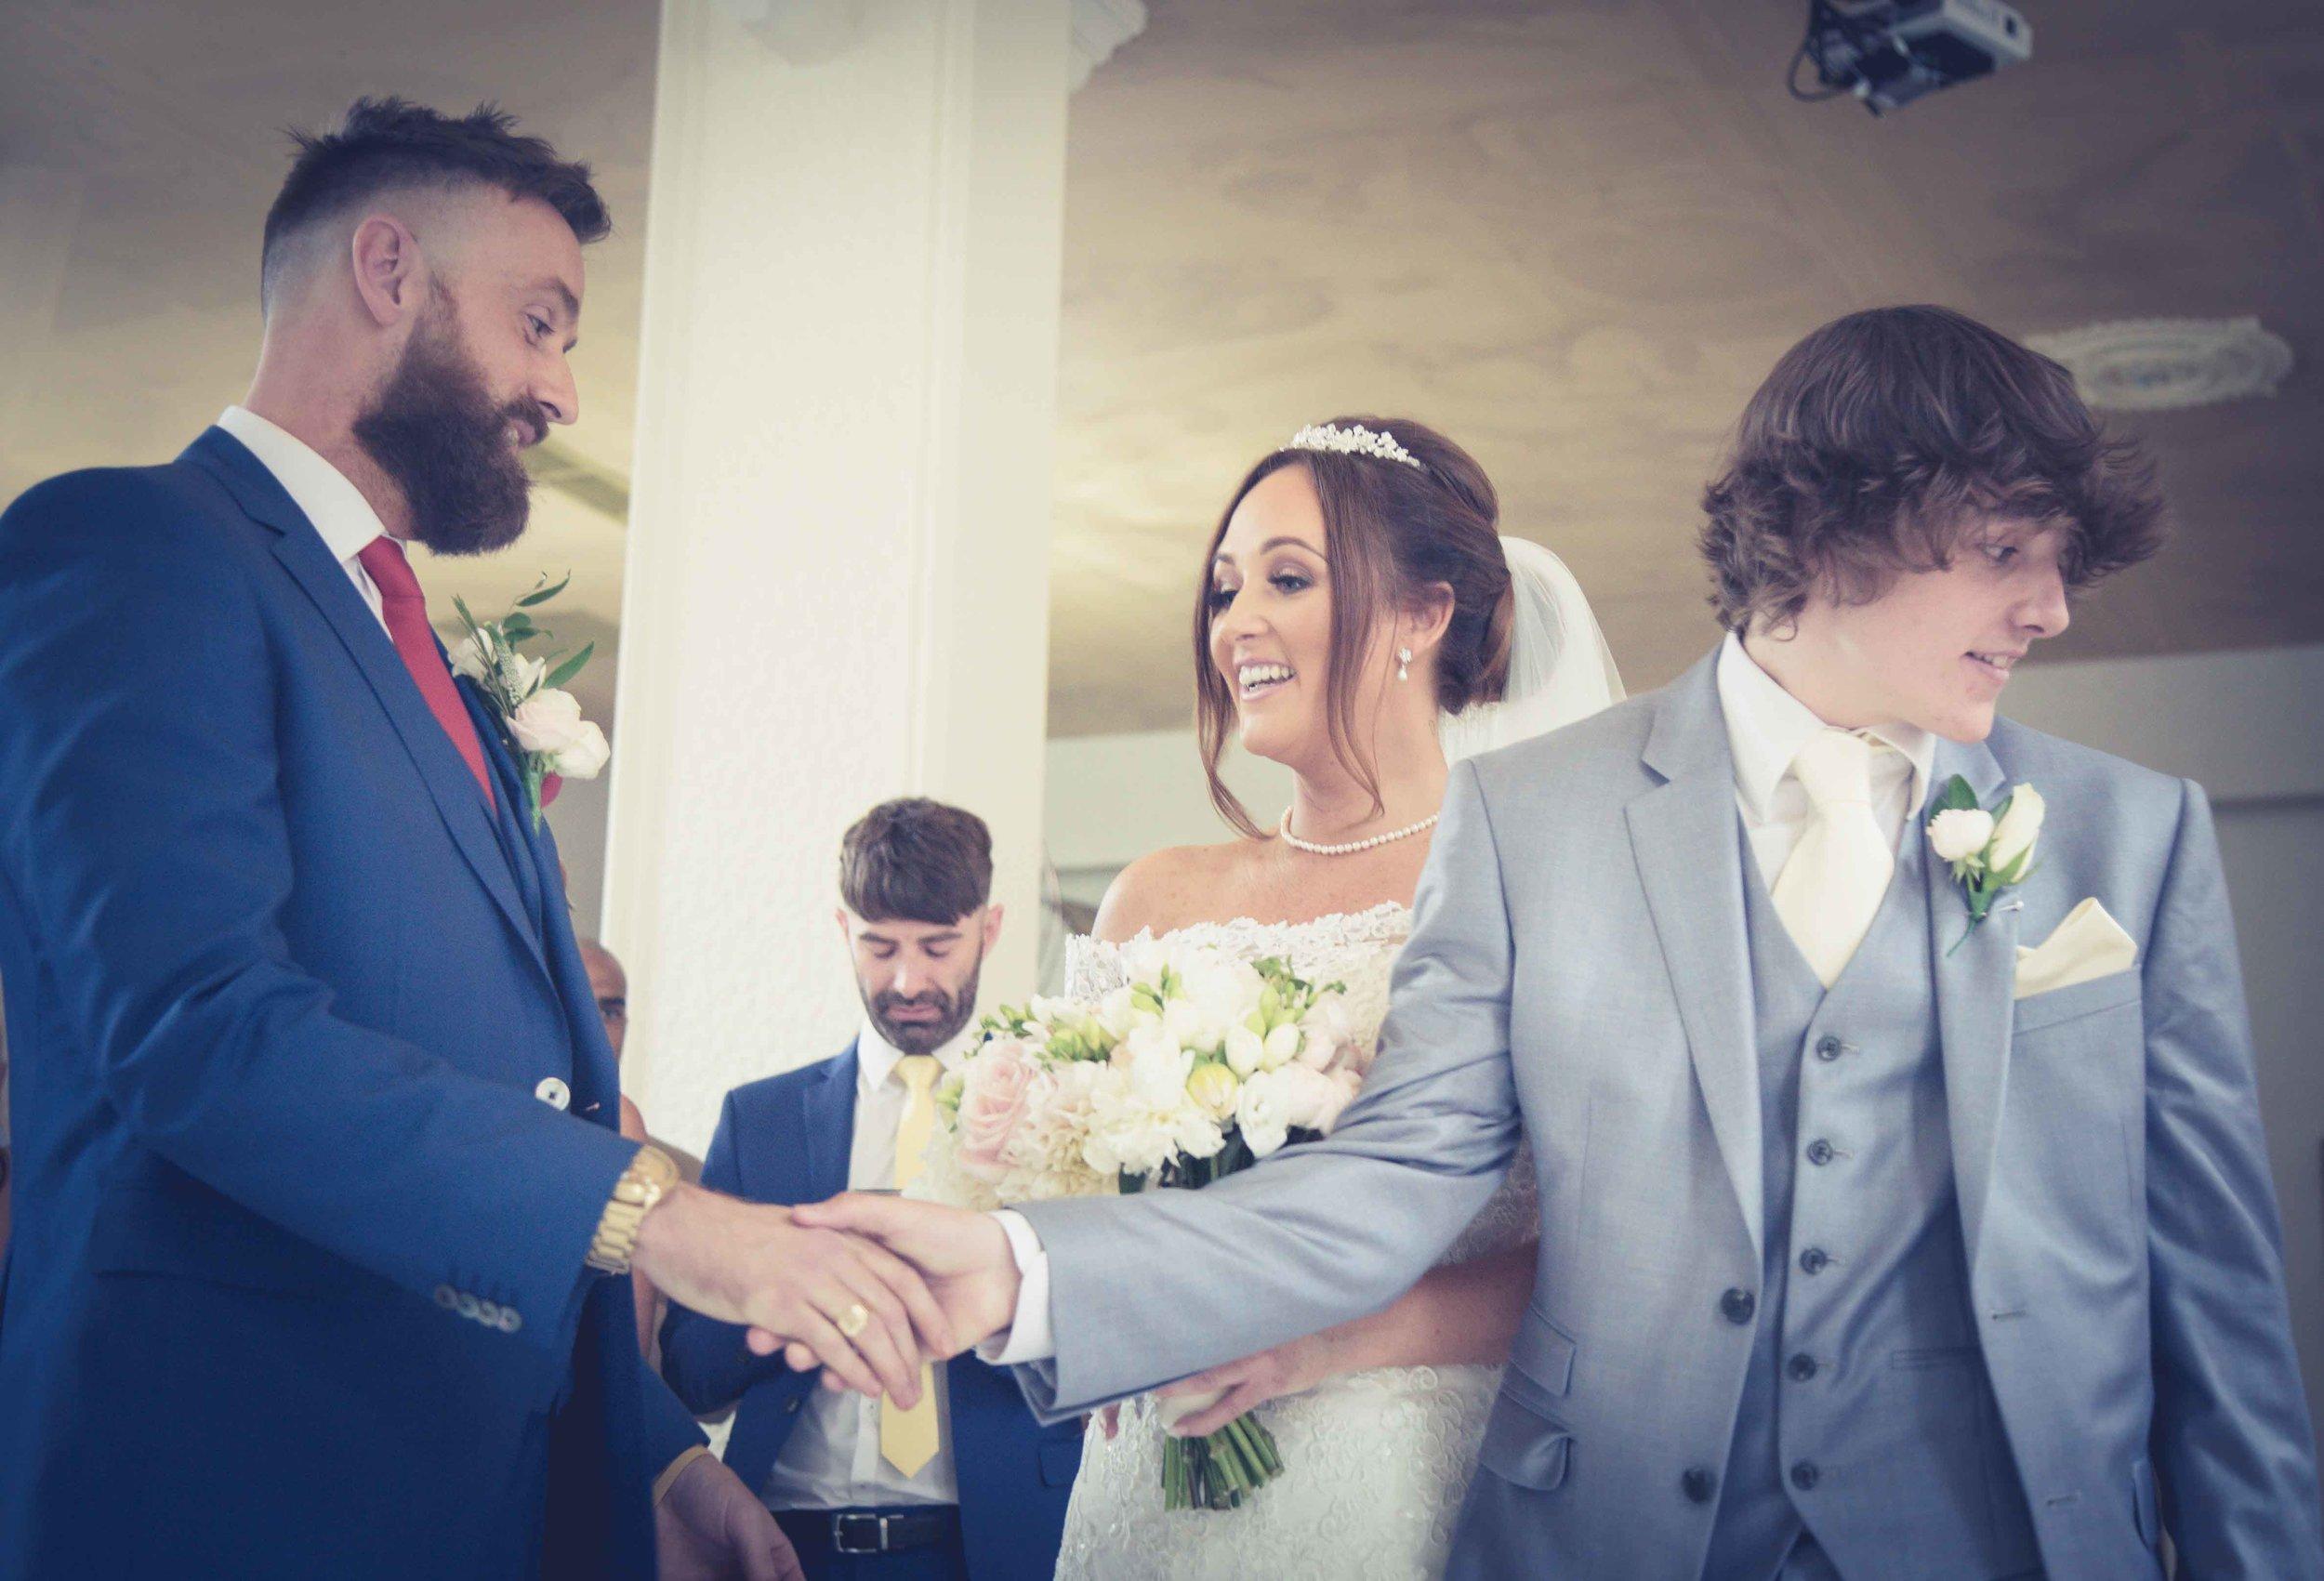 Wedding Photographer Liverpool (1 of 1)-8.jpg